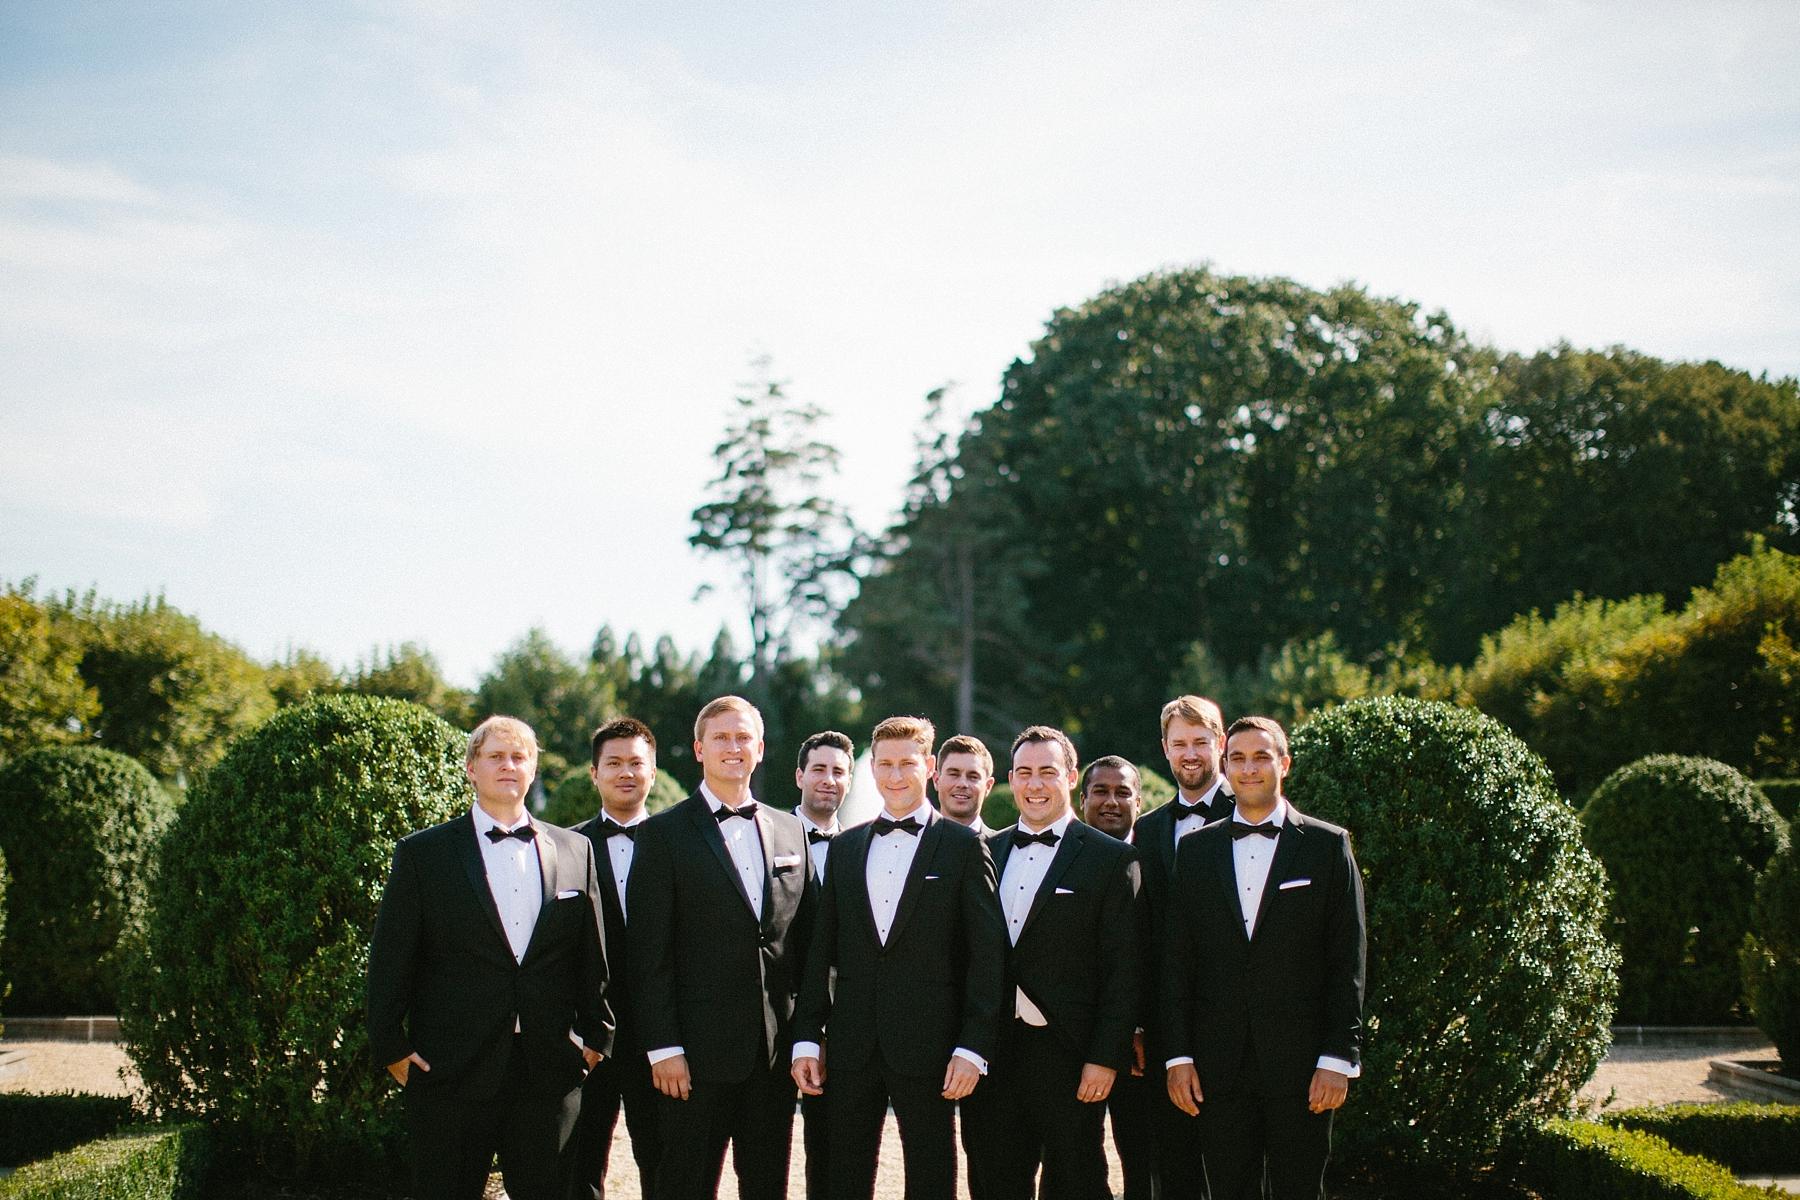 oheka-castle-wedding-nyc-photographer-long-island_0029.jpg